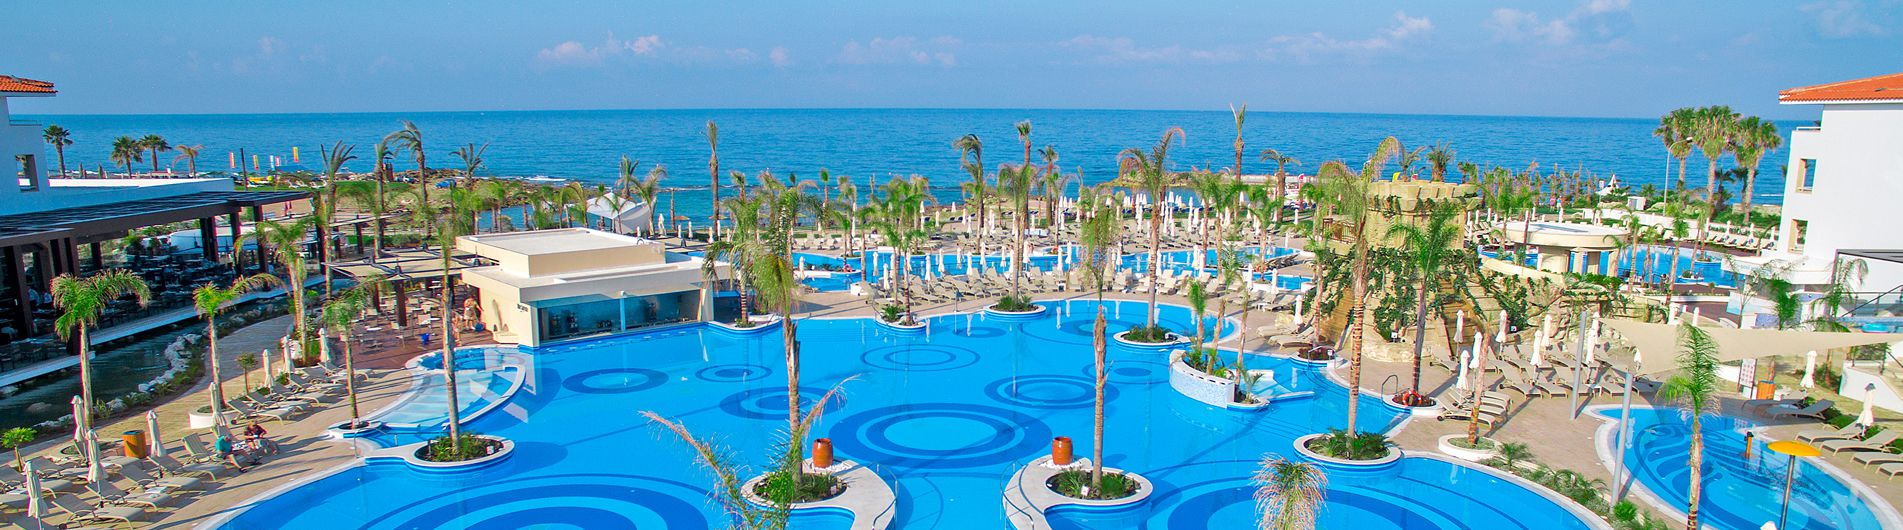 Olympic Lagoon Paphos